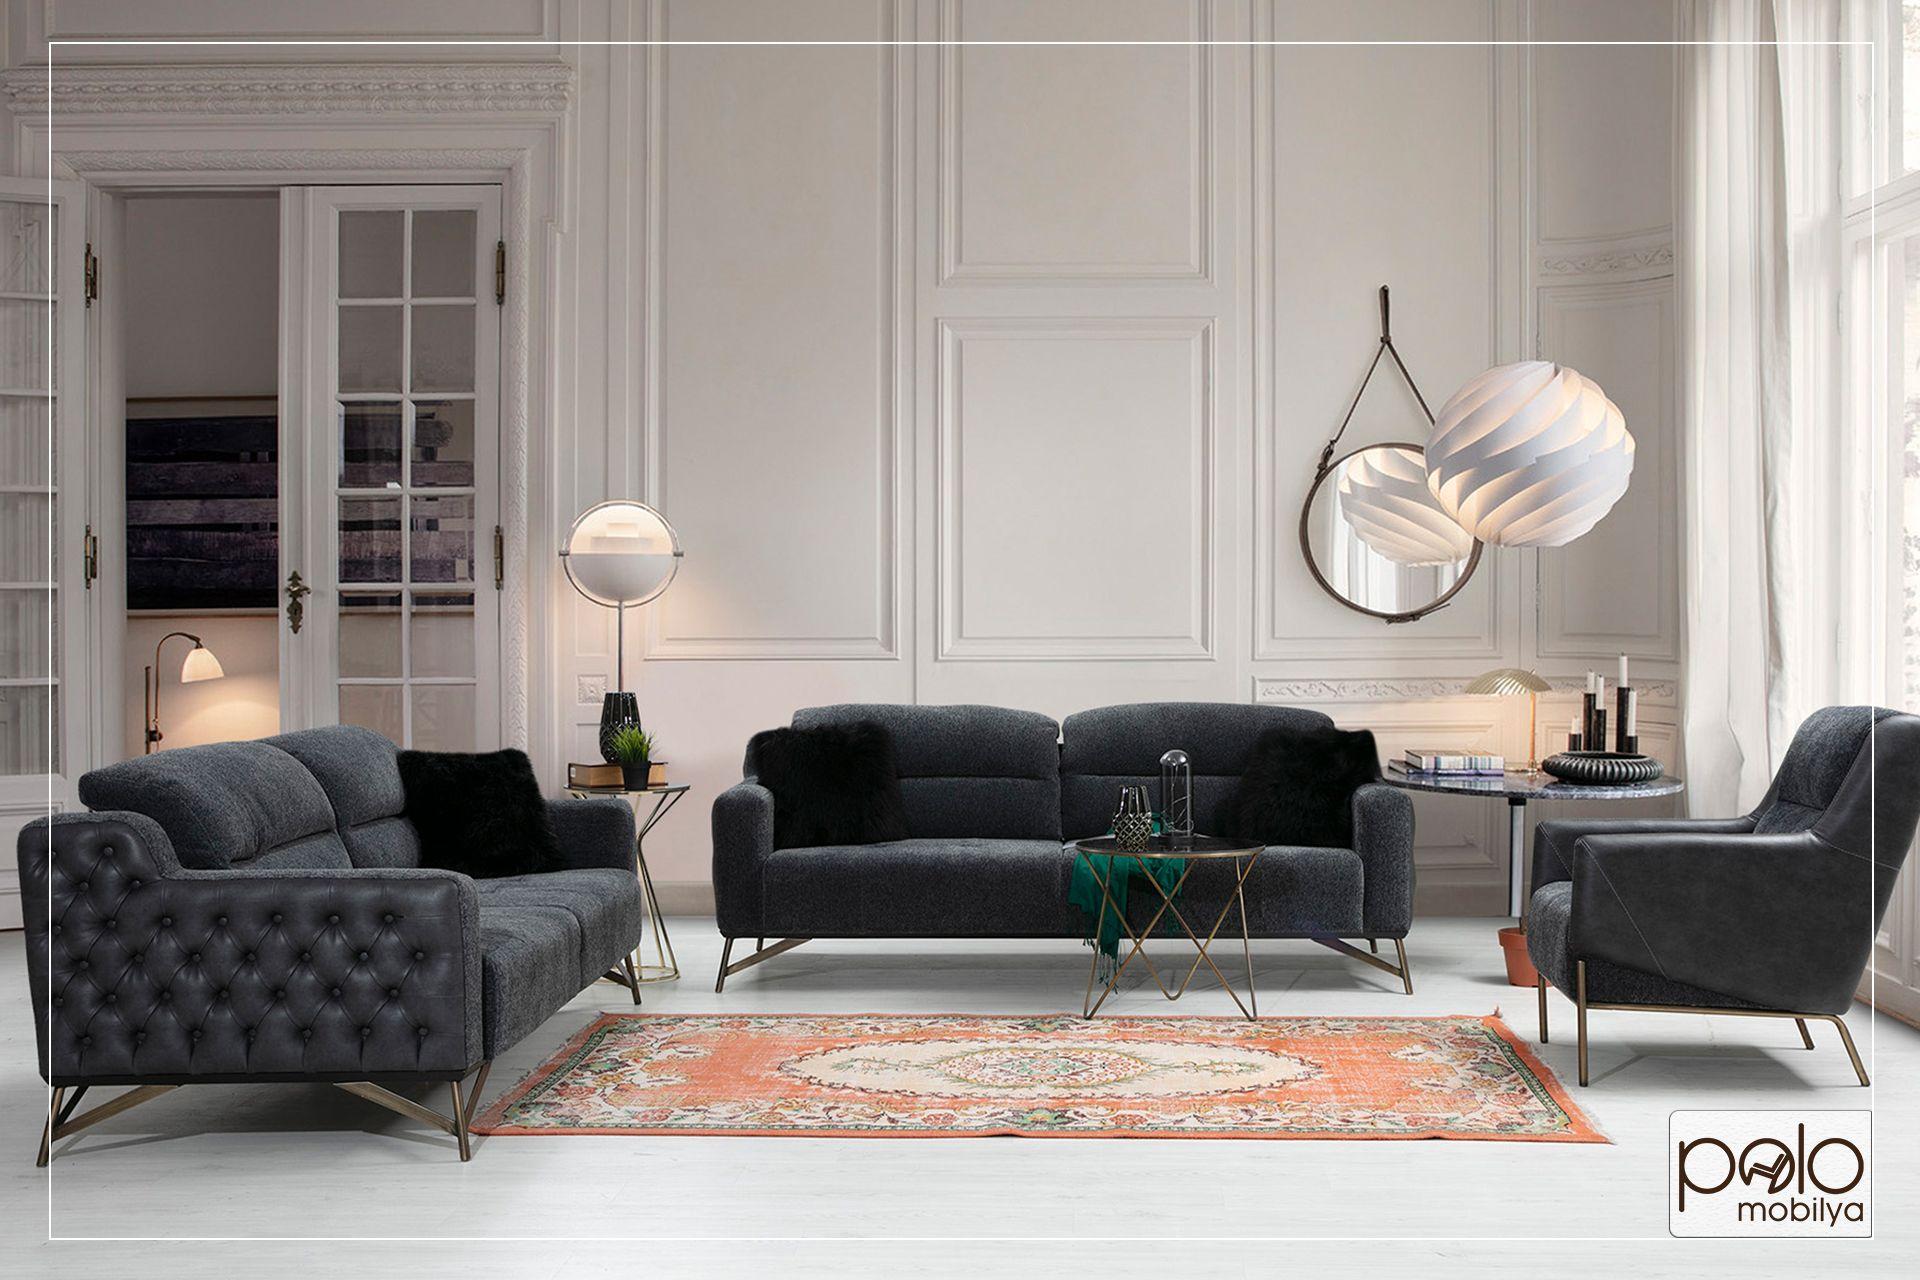 Pin By Polo Mobilya On پایه استیل In 2020 Home Decor Furniture Eames Lounge